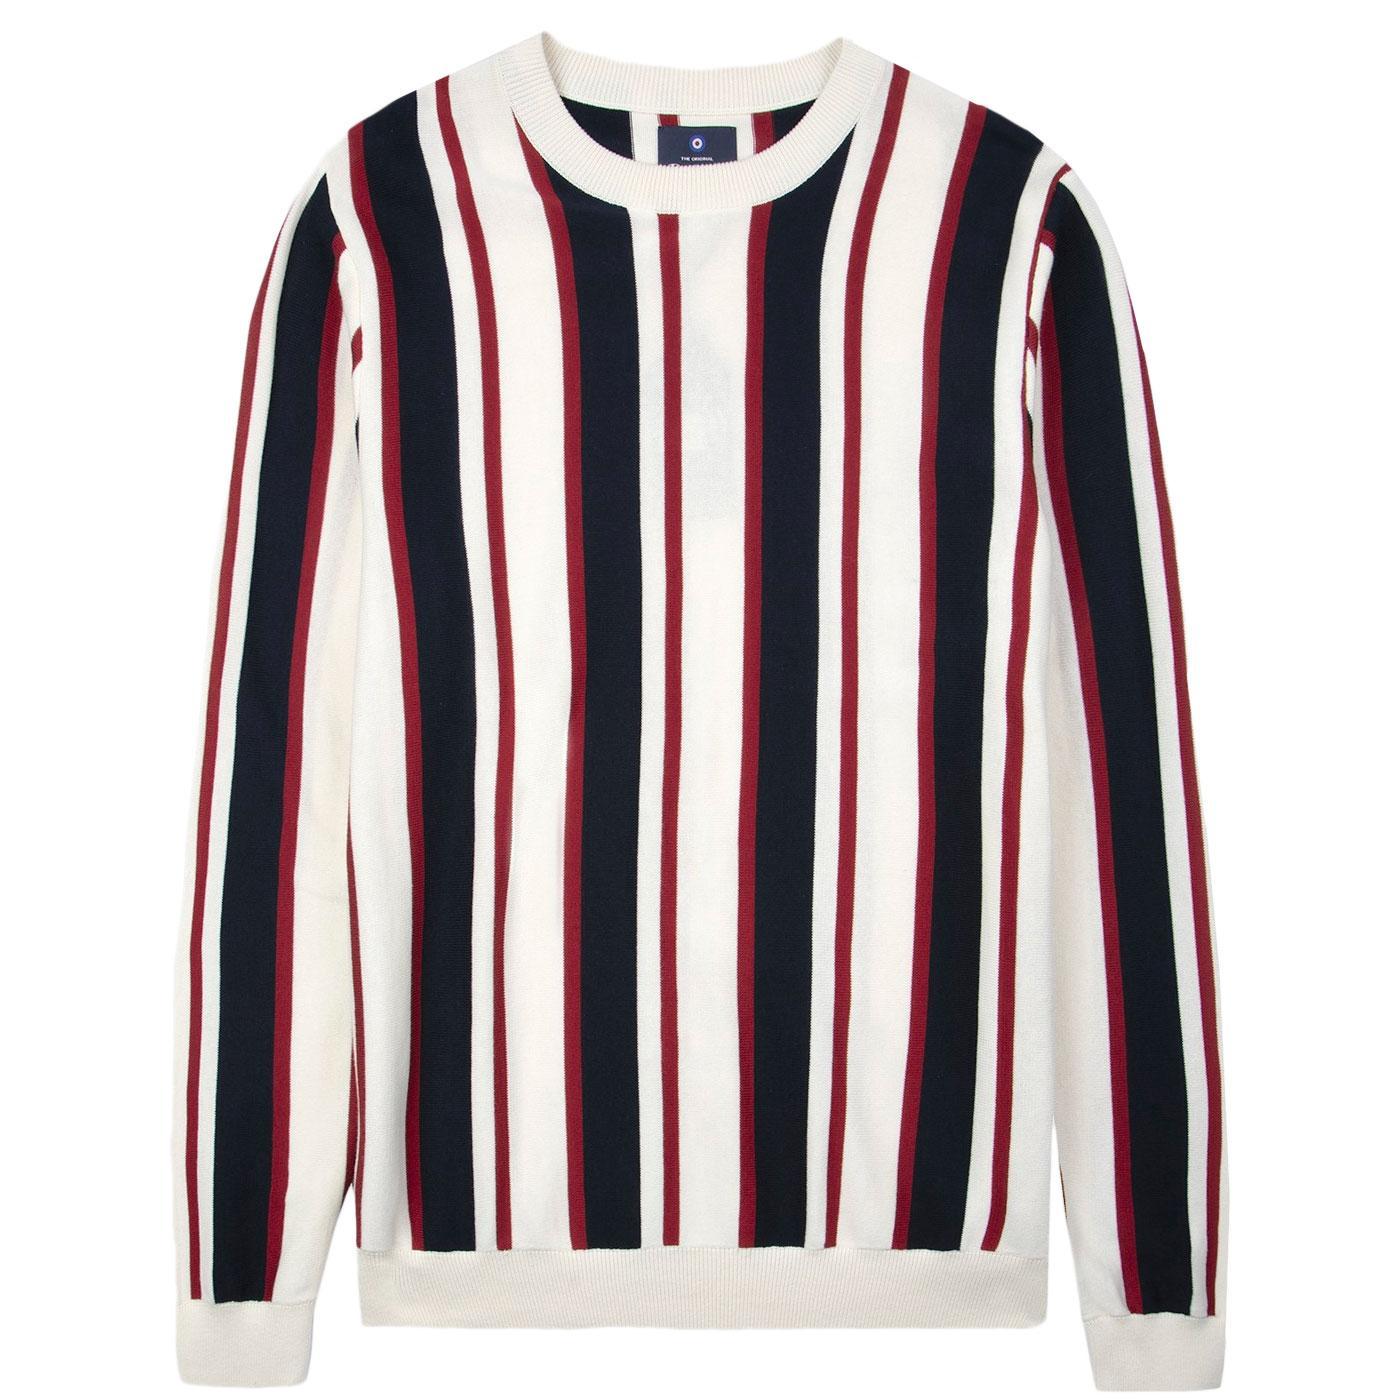 BEN SHERMAN 60s Mod Bold Stripe Knit Crew Jumper